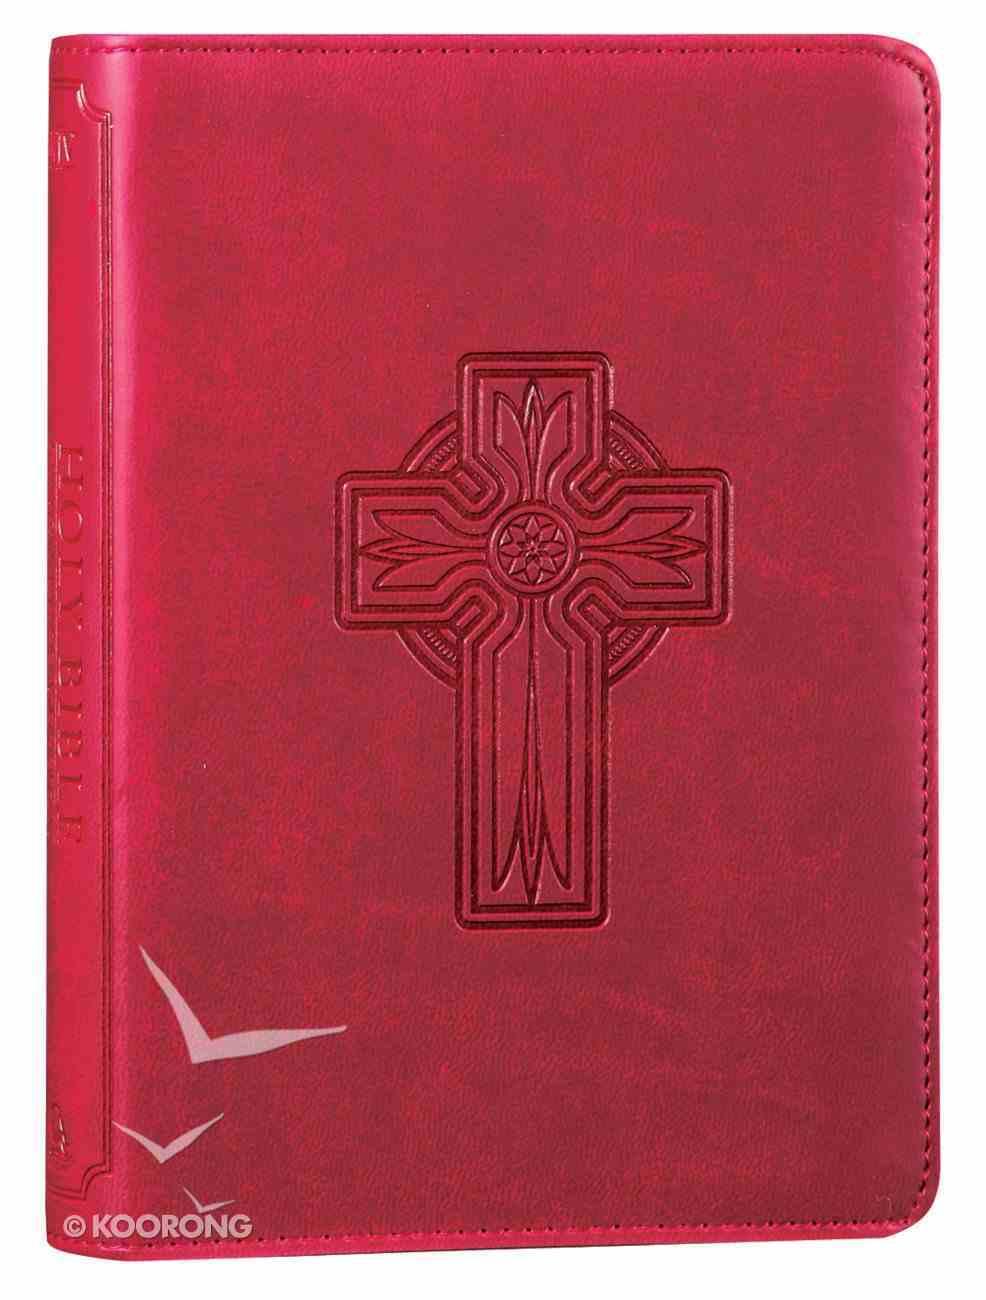 KJV Pocket Bible Berry With Cross Imitation Leather